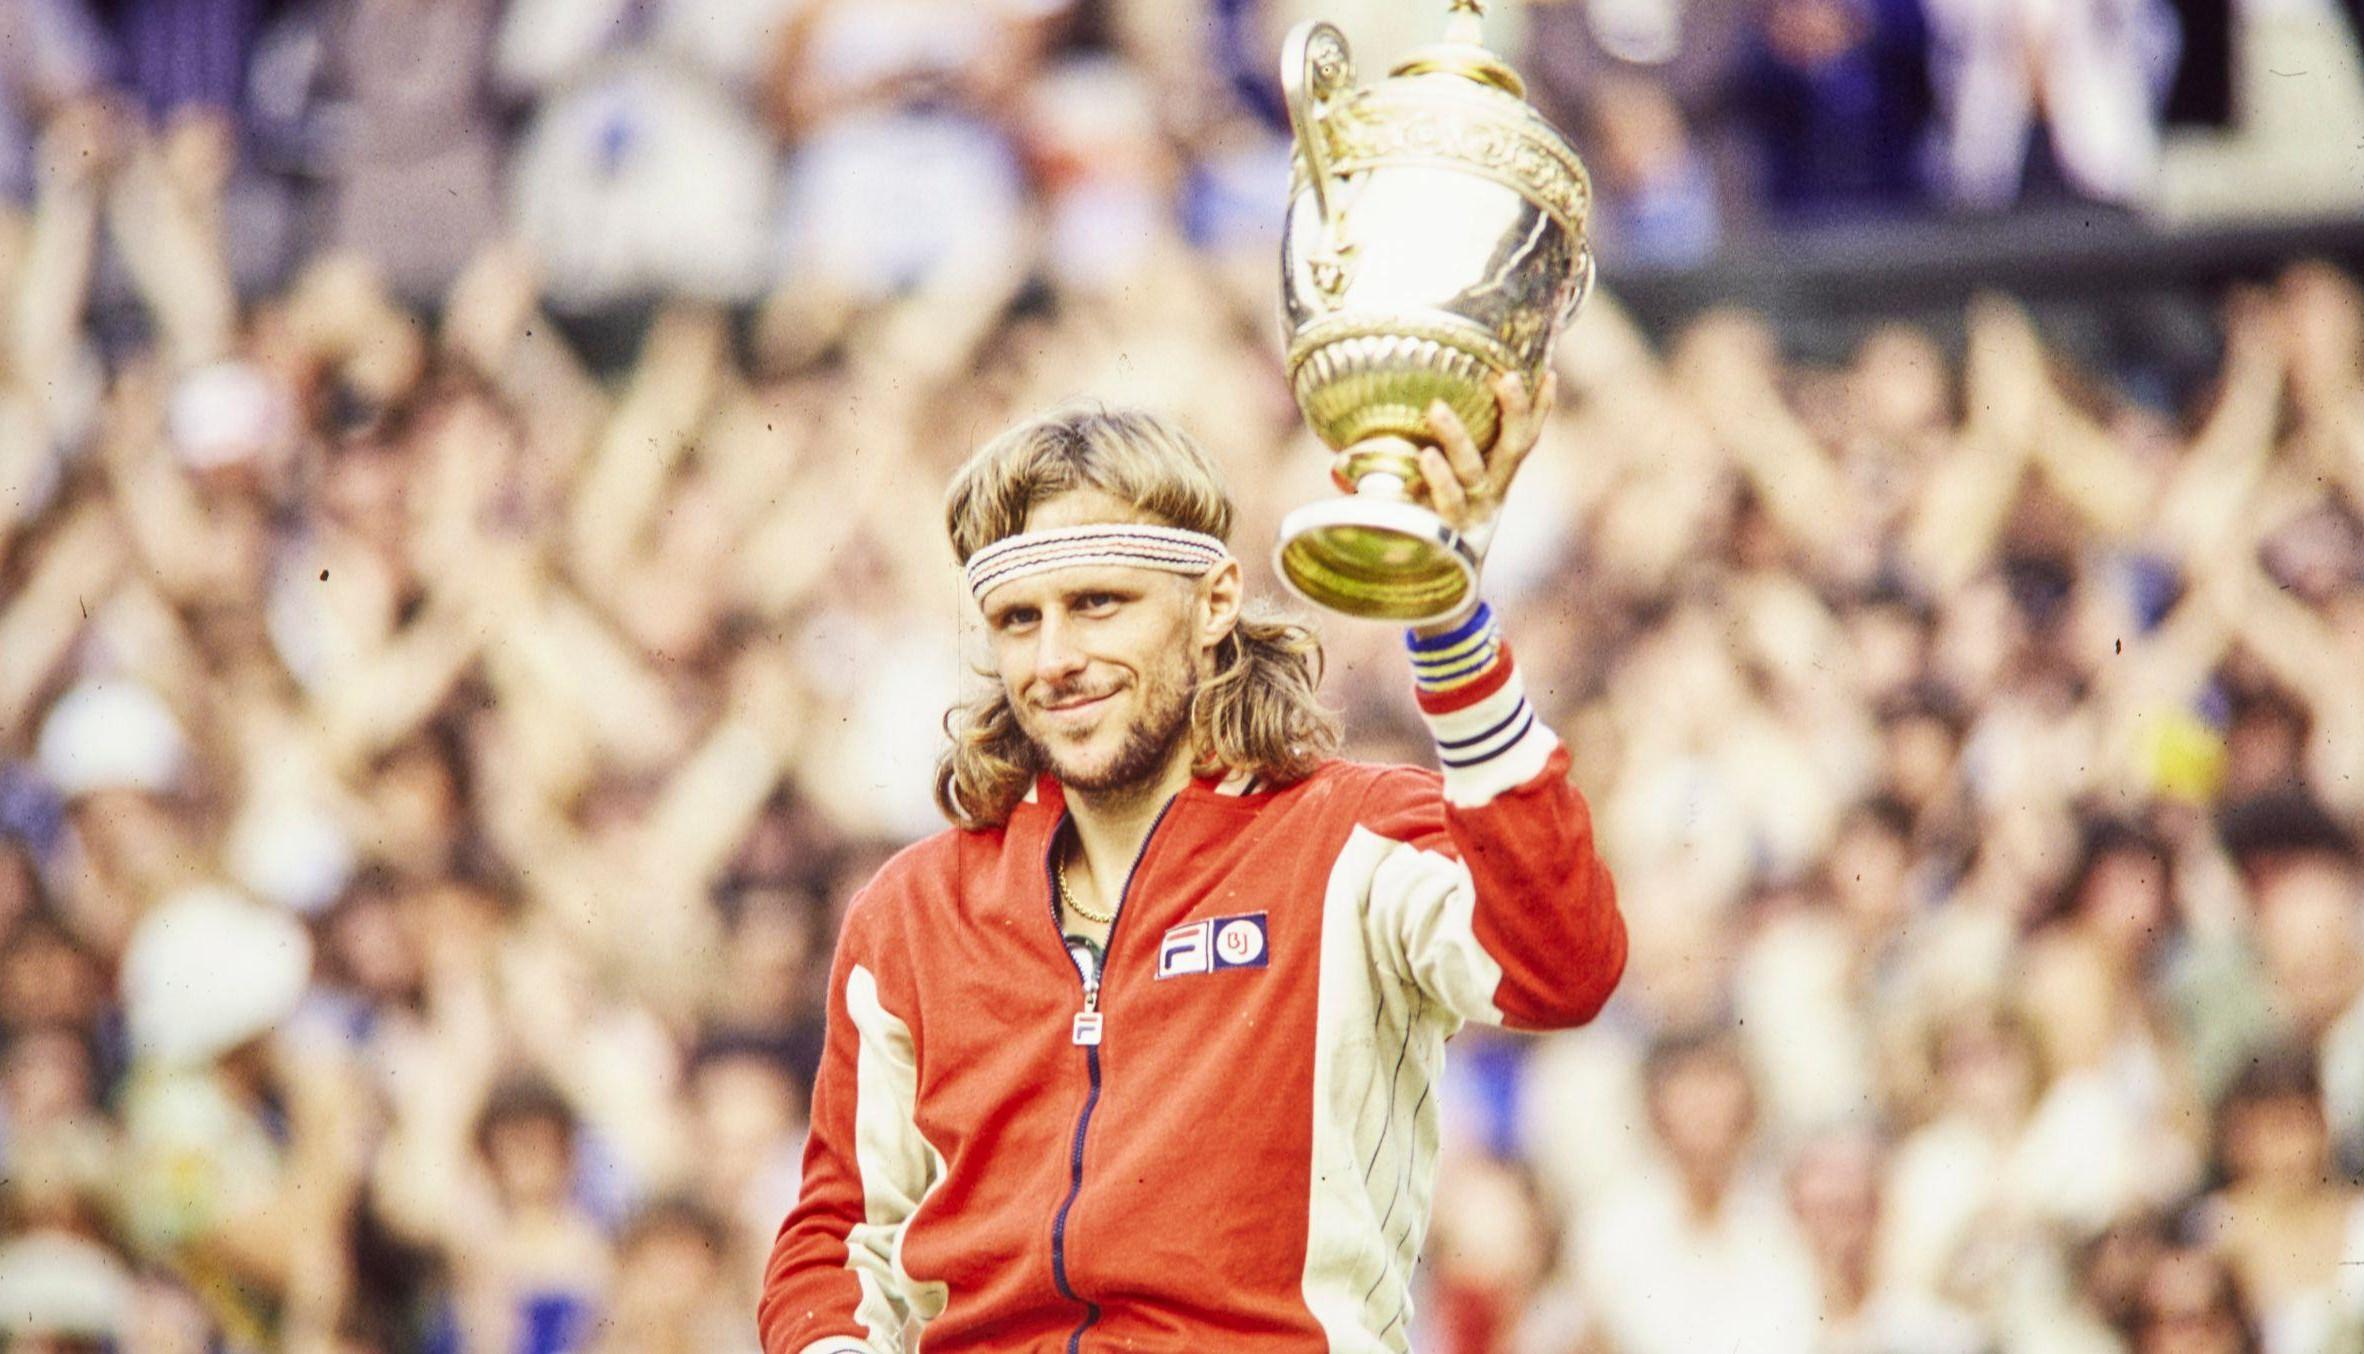 Bjorn Borg Fila Wimbledon main